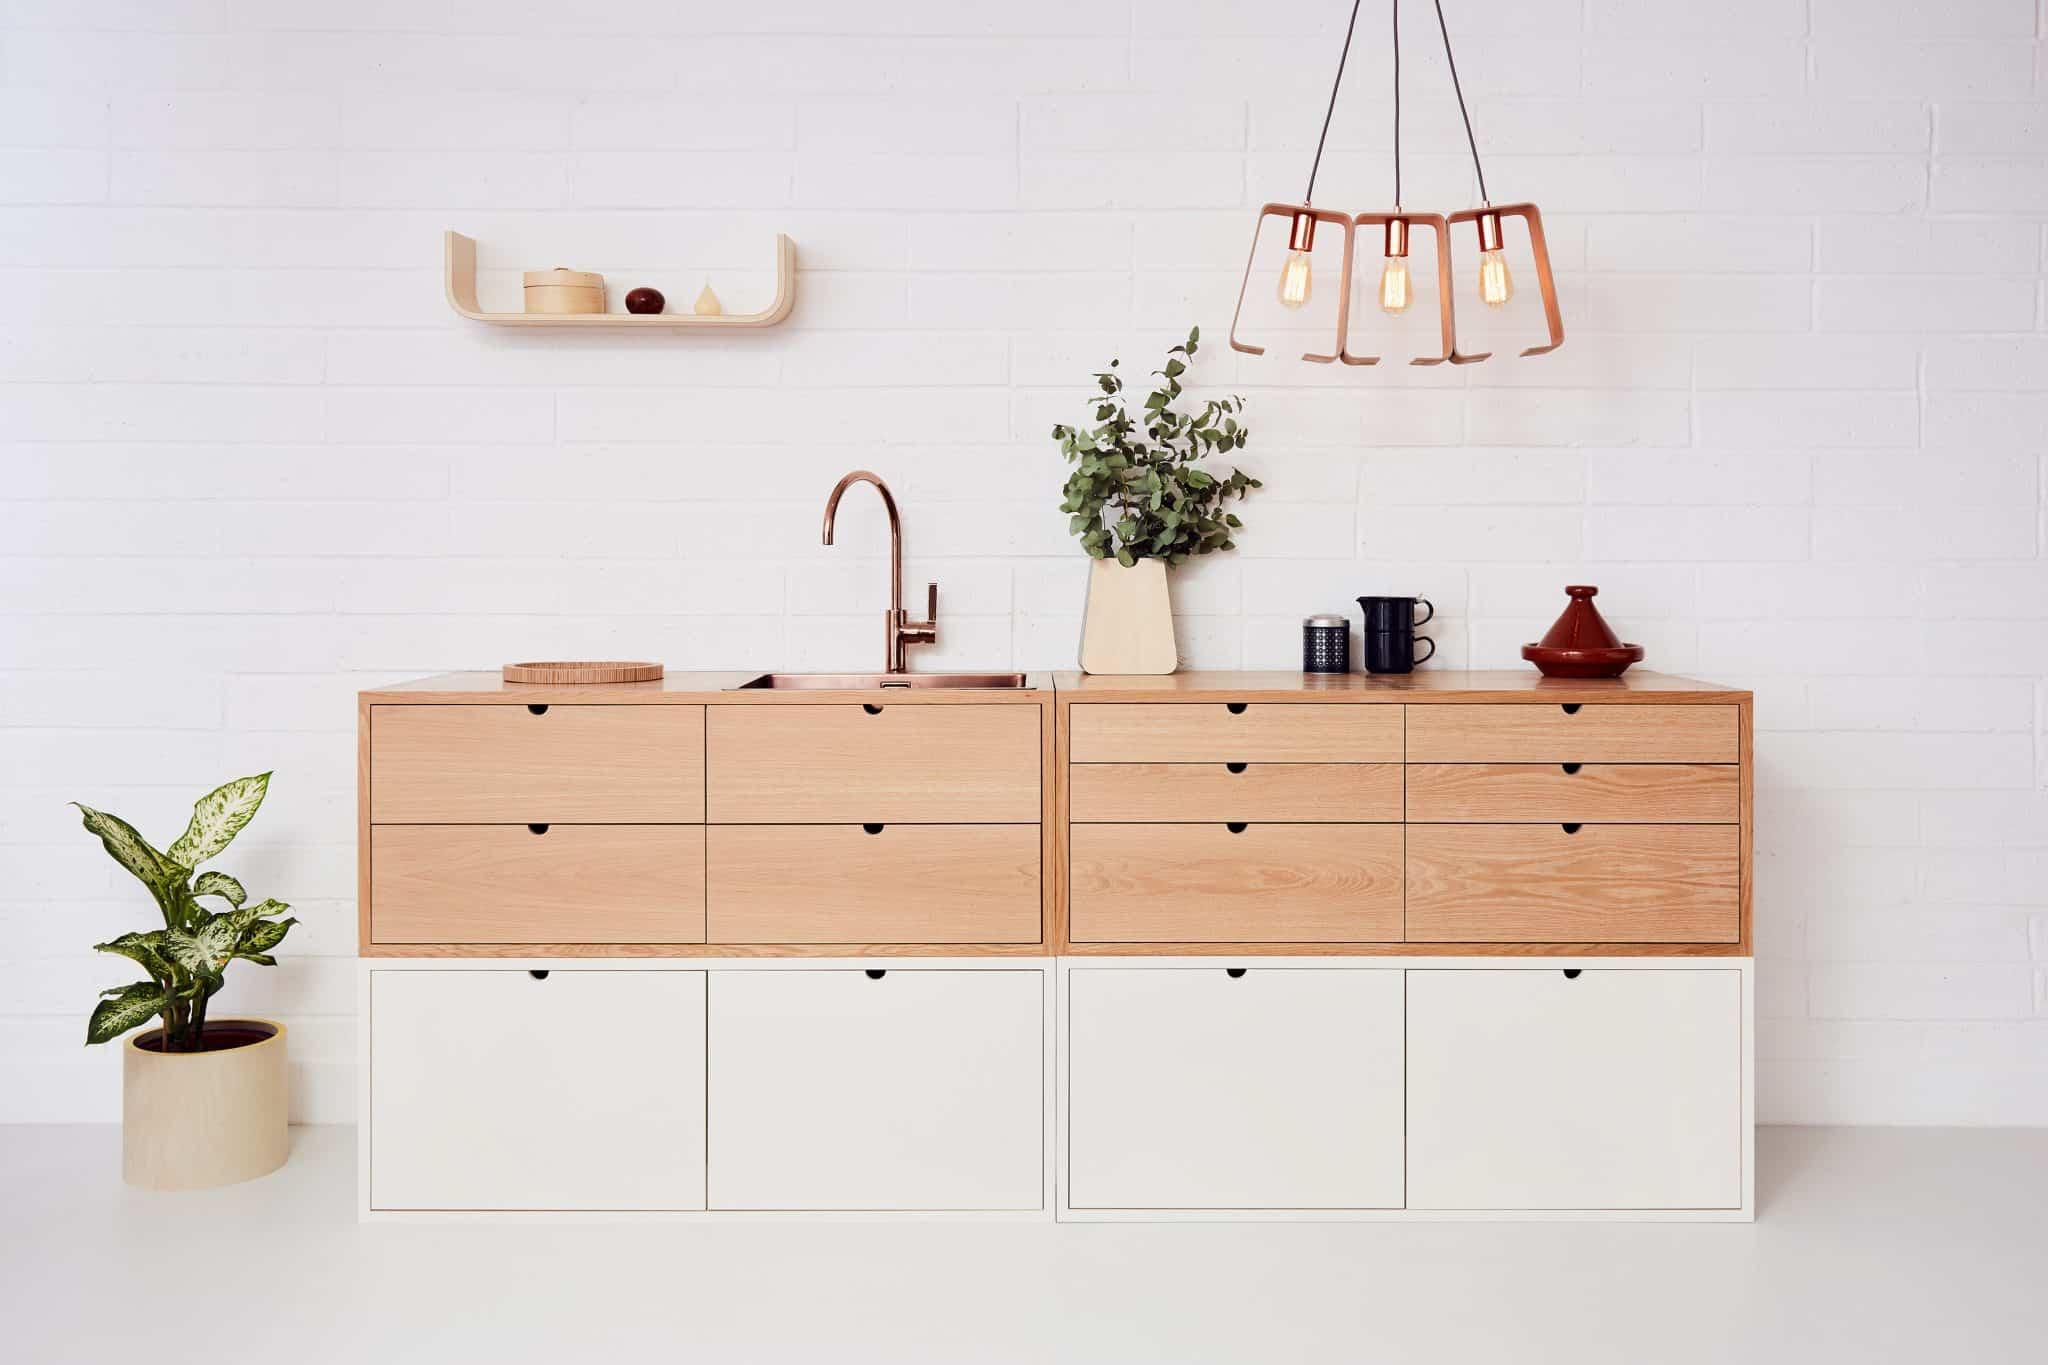 lozi collection kitchen cupboard design